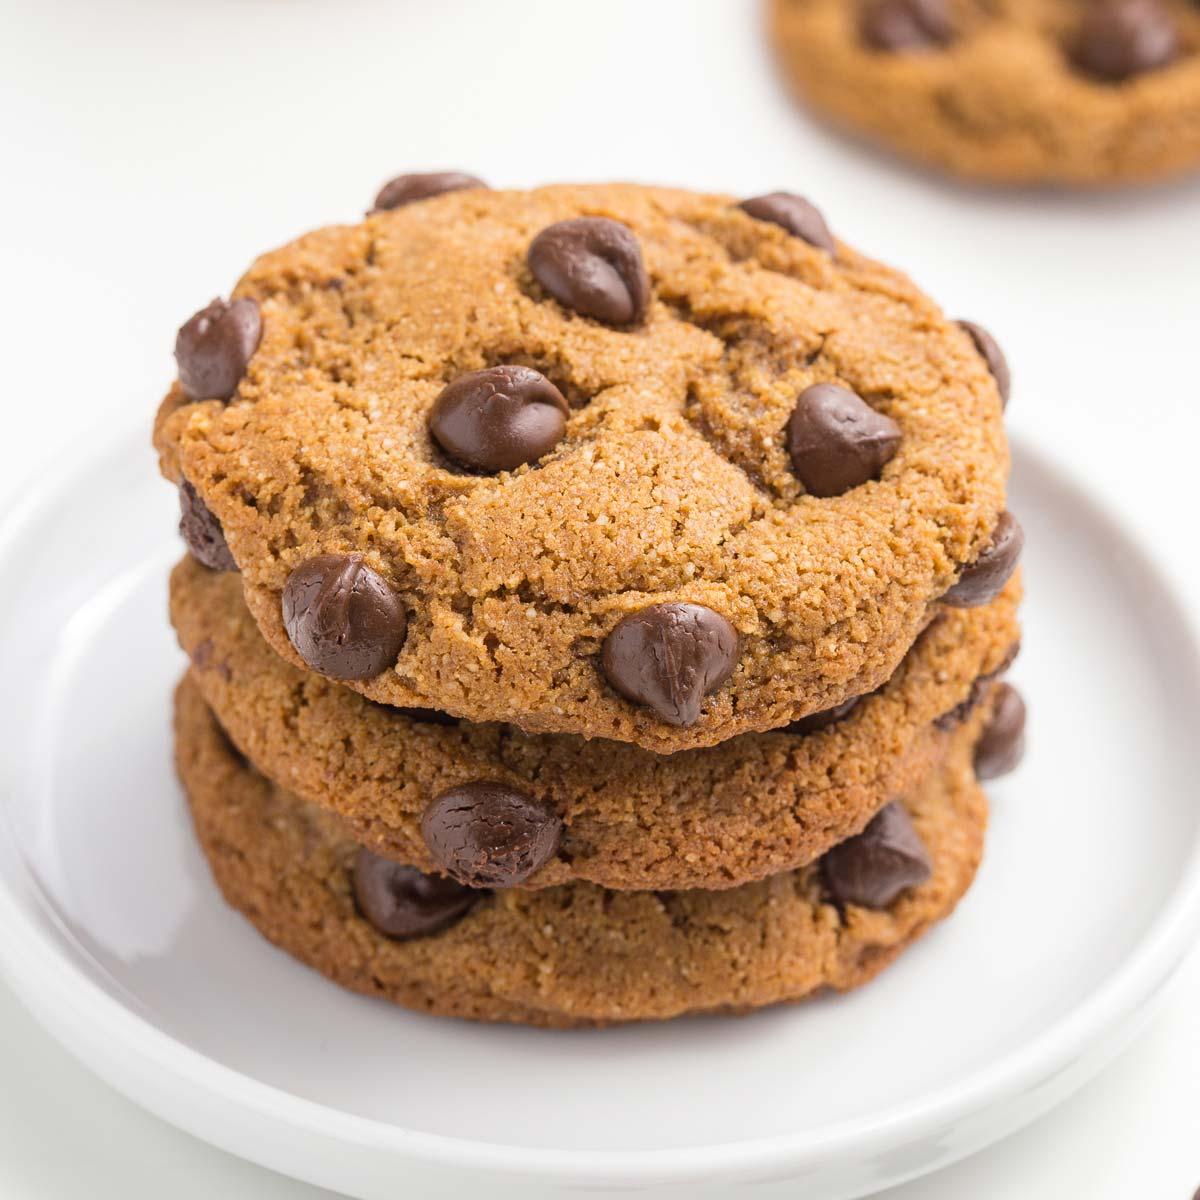 Coconut Flour Cookies - Perfect Texture! (paleo, keto, vegan options) -  Texanerin Baking